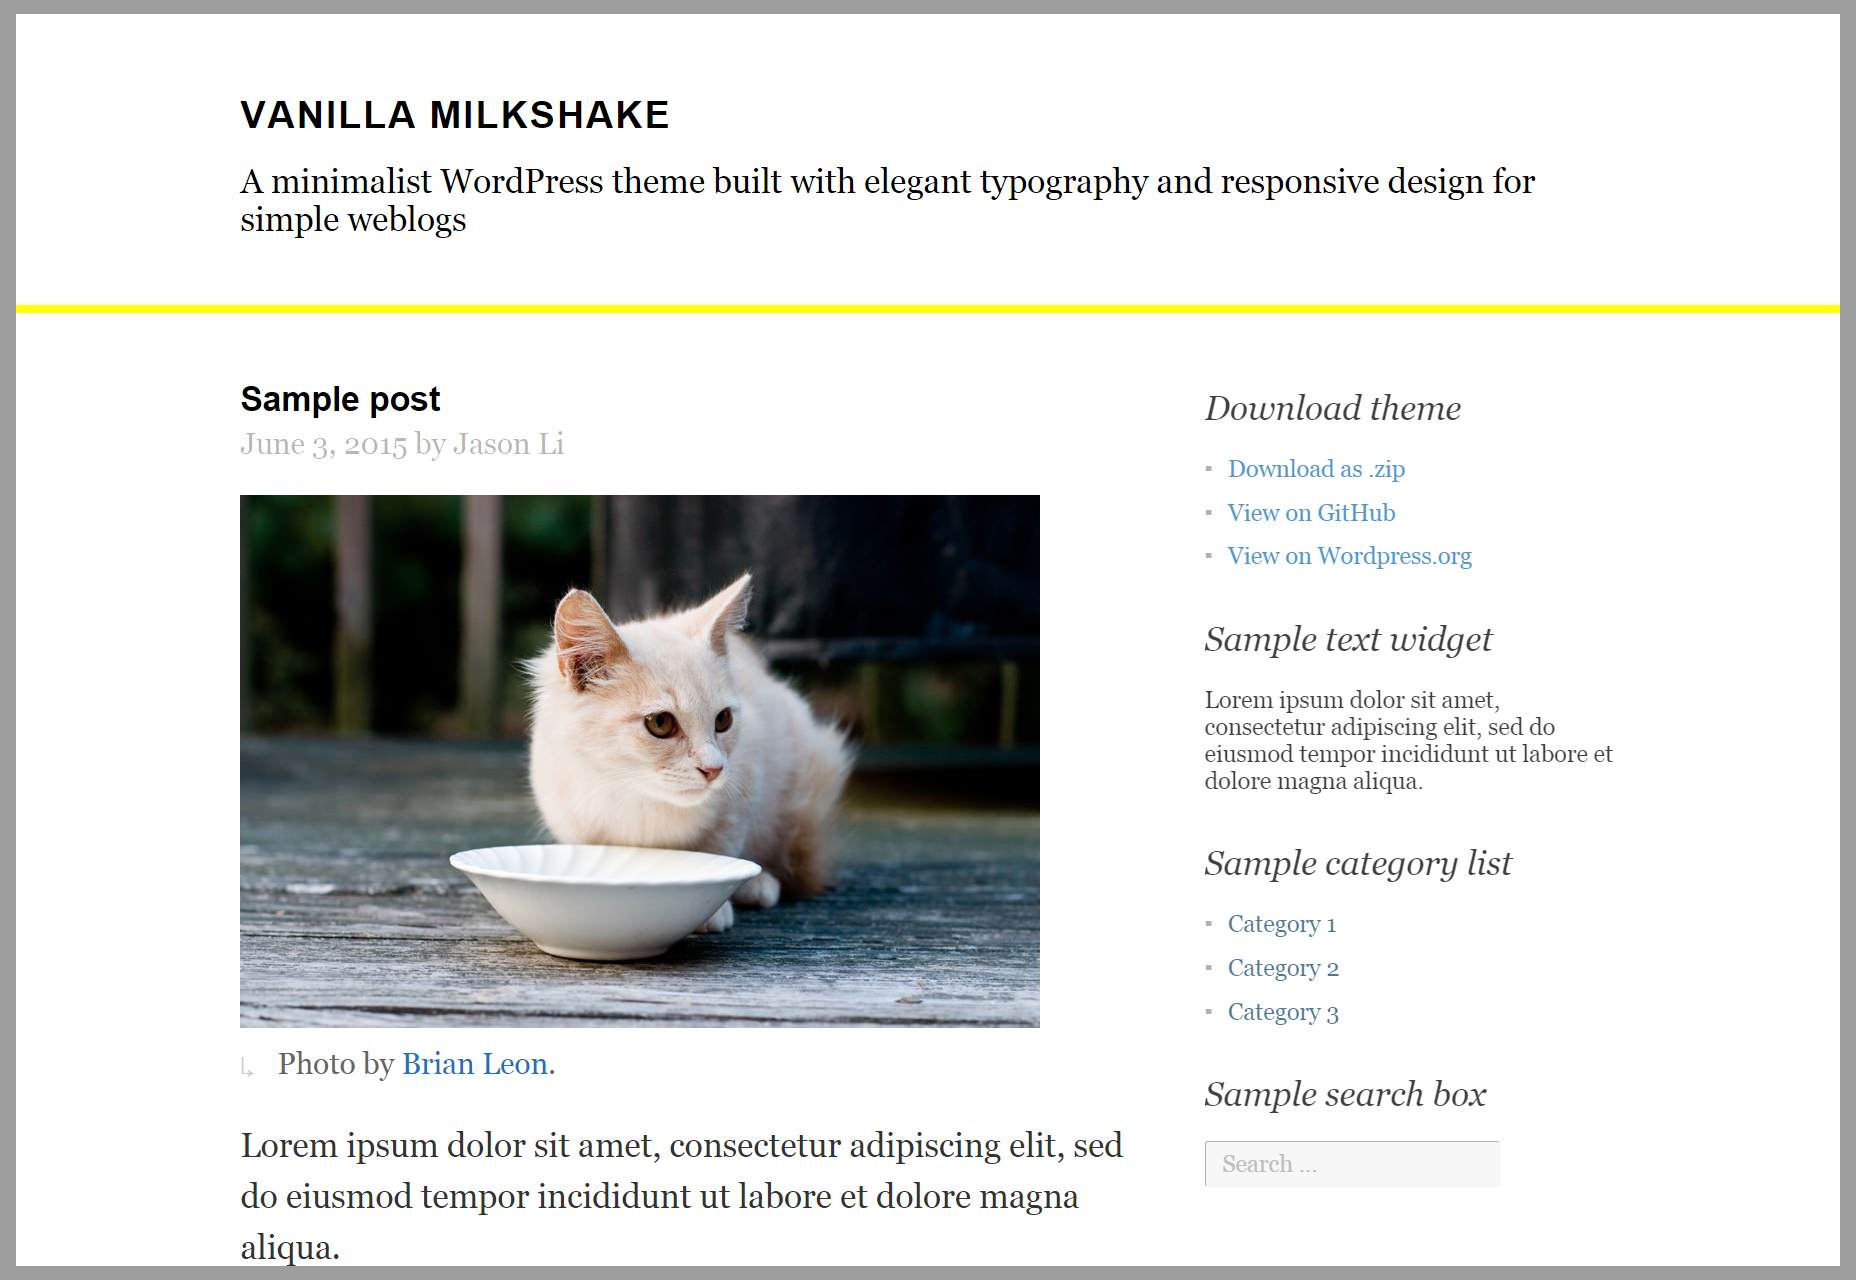 vanilla-milkshake-simple-blogging-wordpress-theme